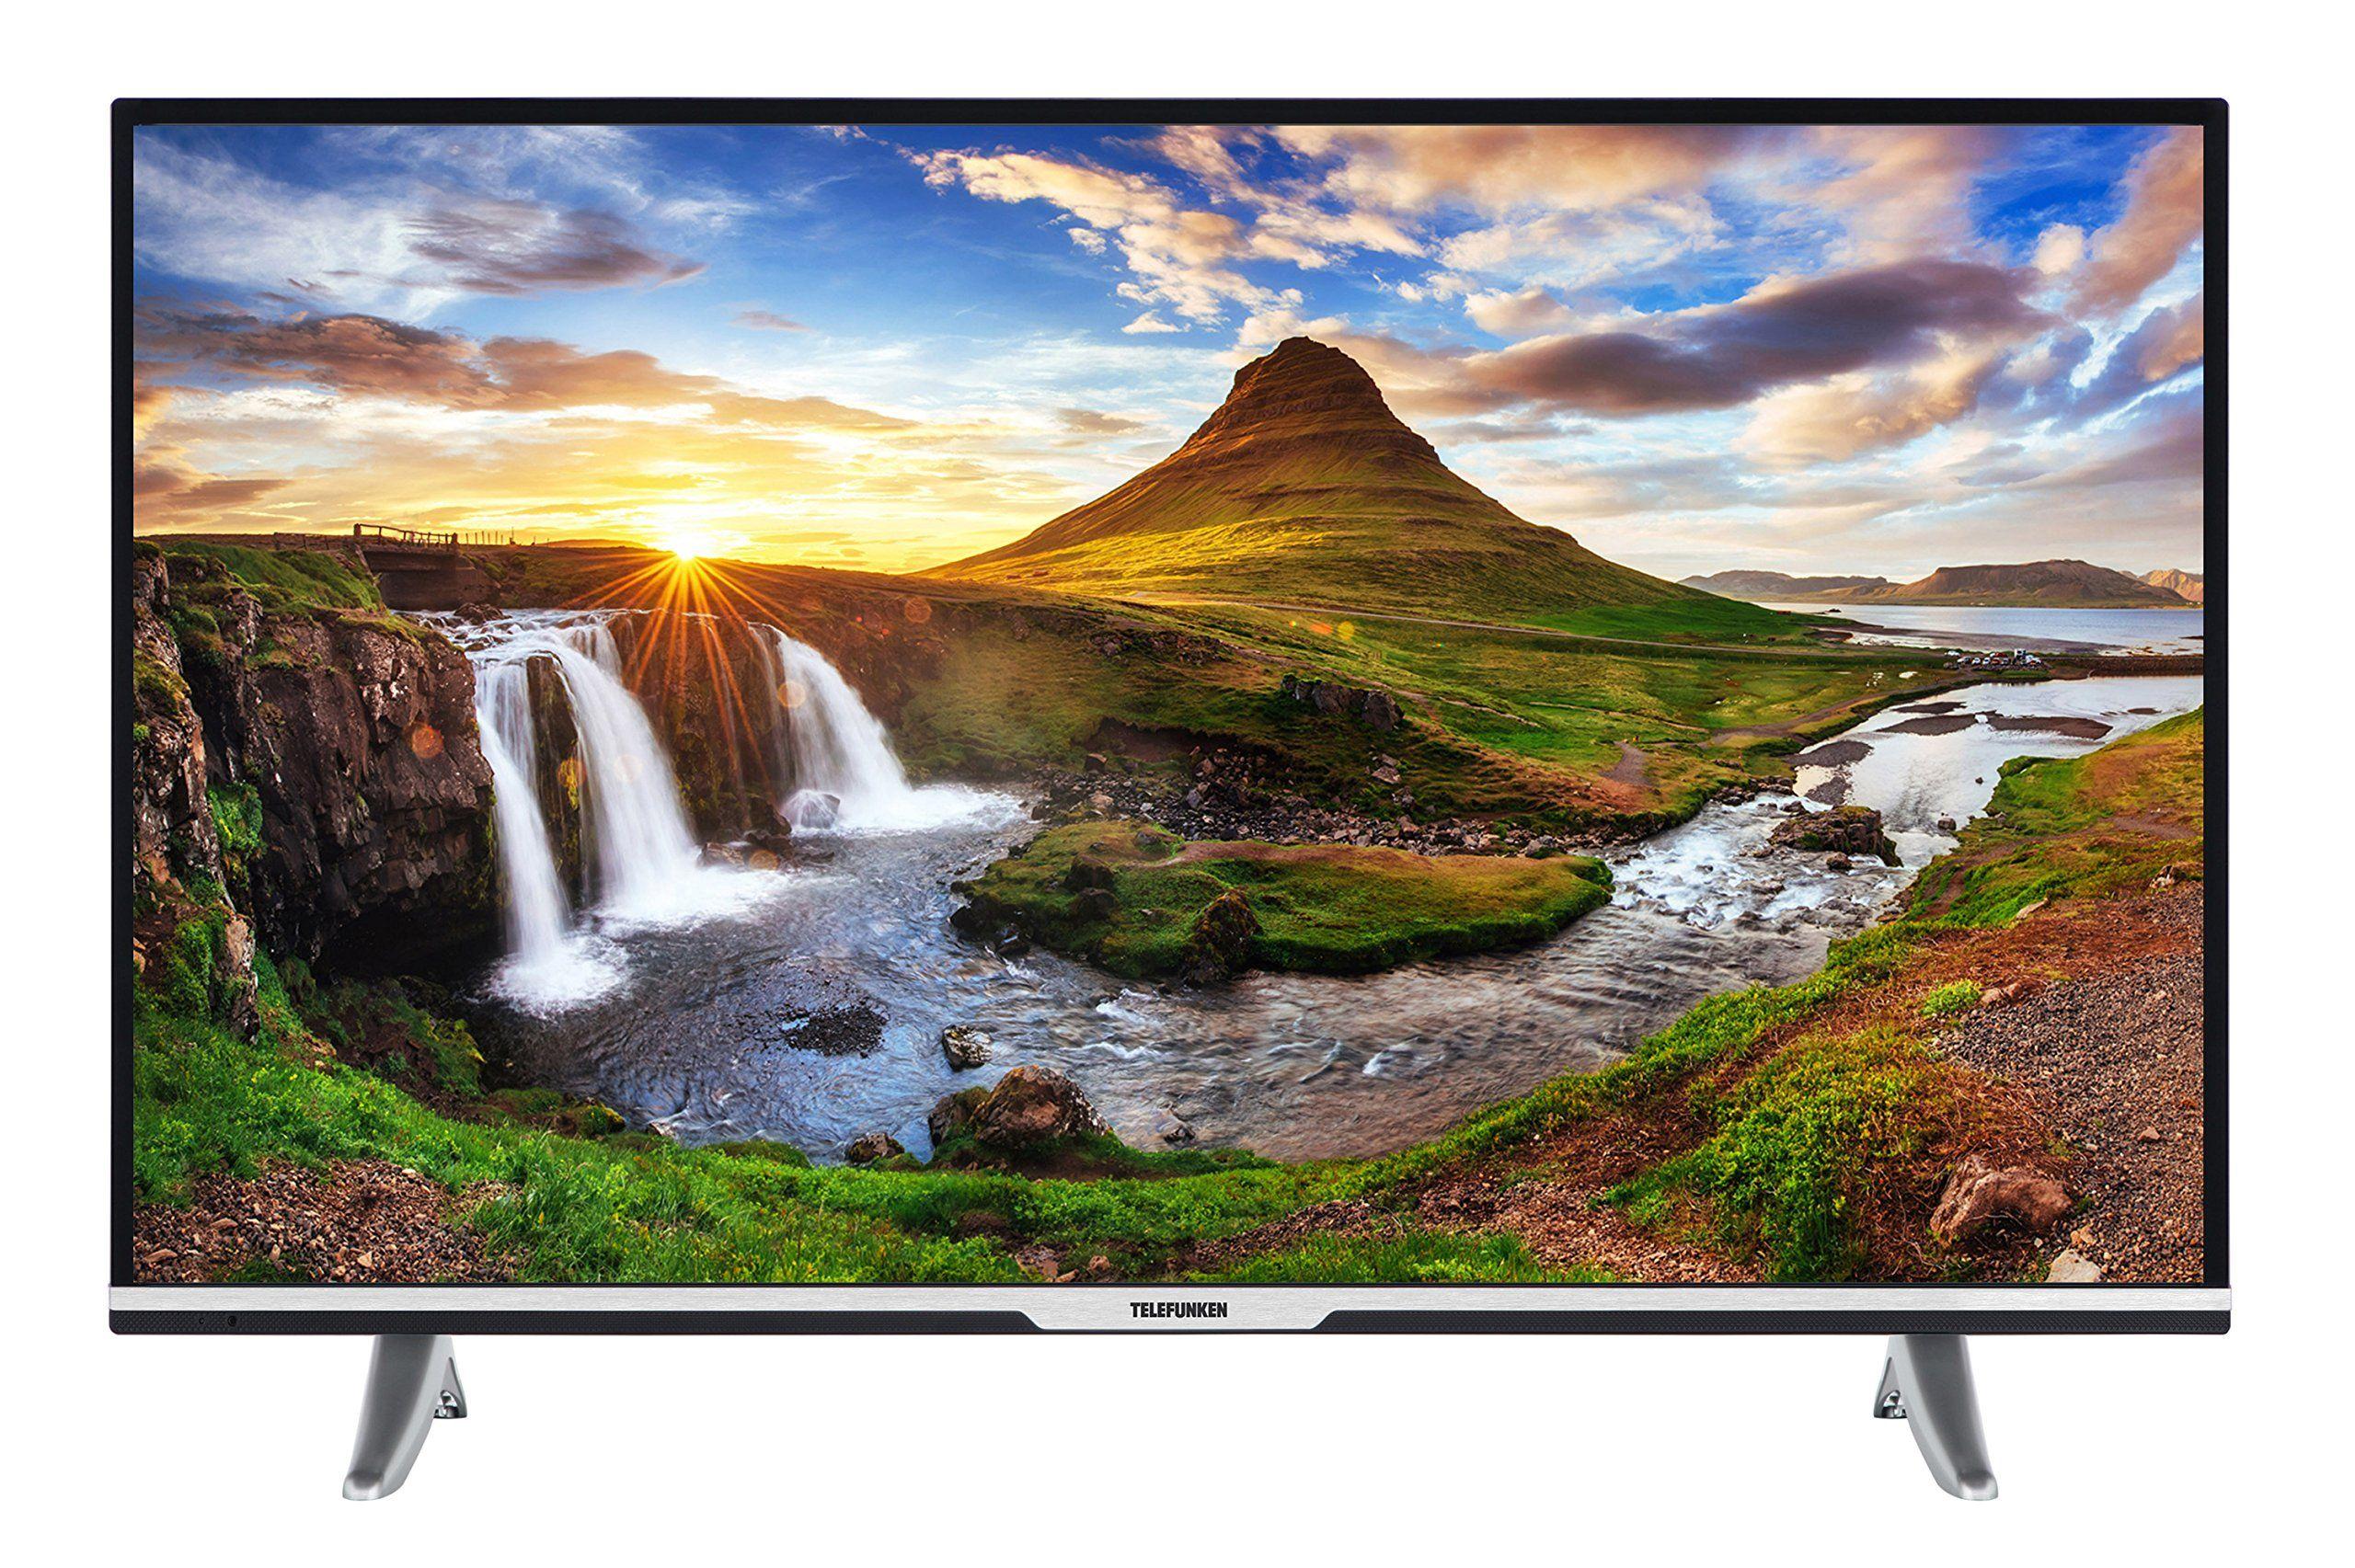 Telefunken Xu43d101 108 Cm 43 Zoll Fernseher 4k Ultra Hd Triple Tuner In 2020 Led Fernseher Fernseher Dvb T2